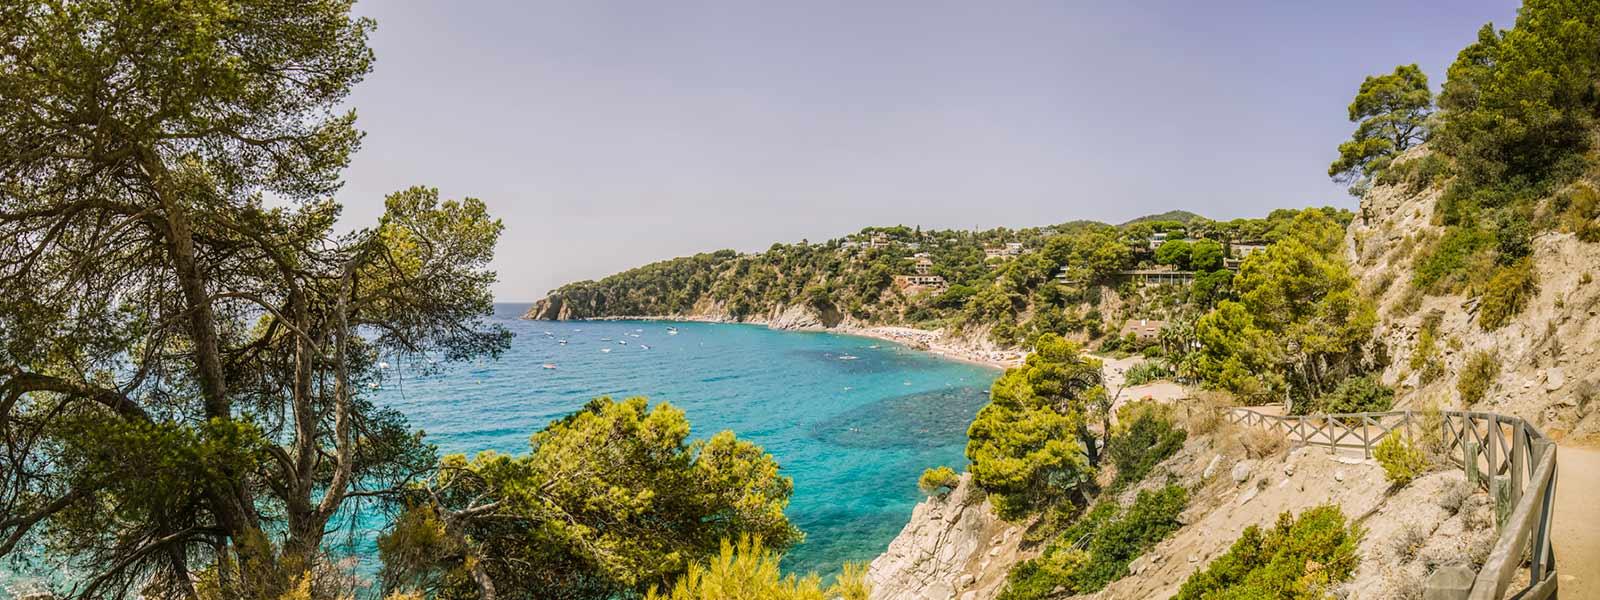 Camping Tossa De Mar En Espagne Sur La Costa Brava | Camping ... intérieur Camping Bord De Mer Mediterranee Avec Piscine